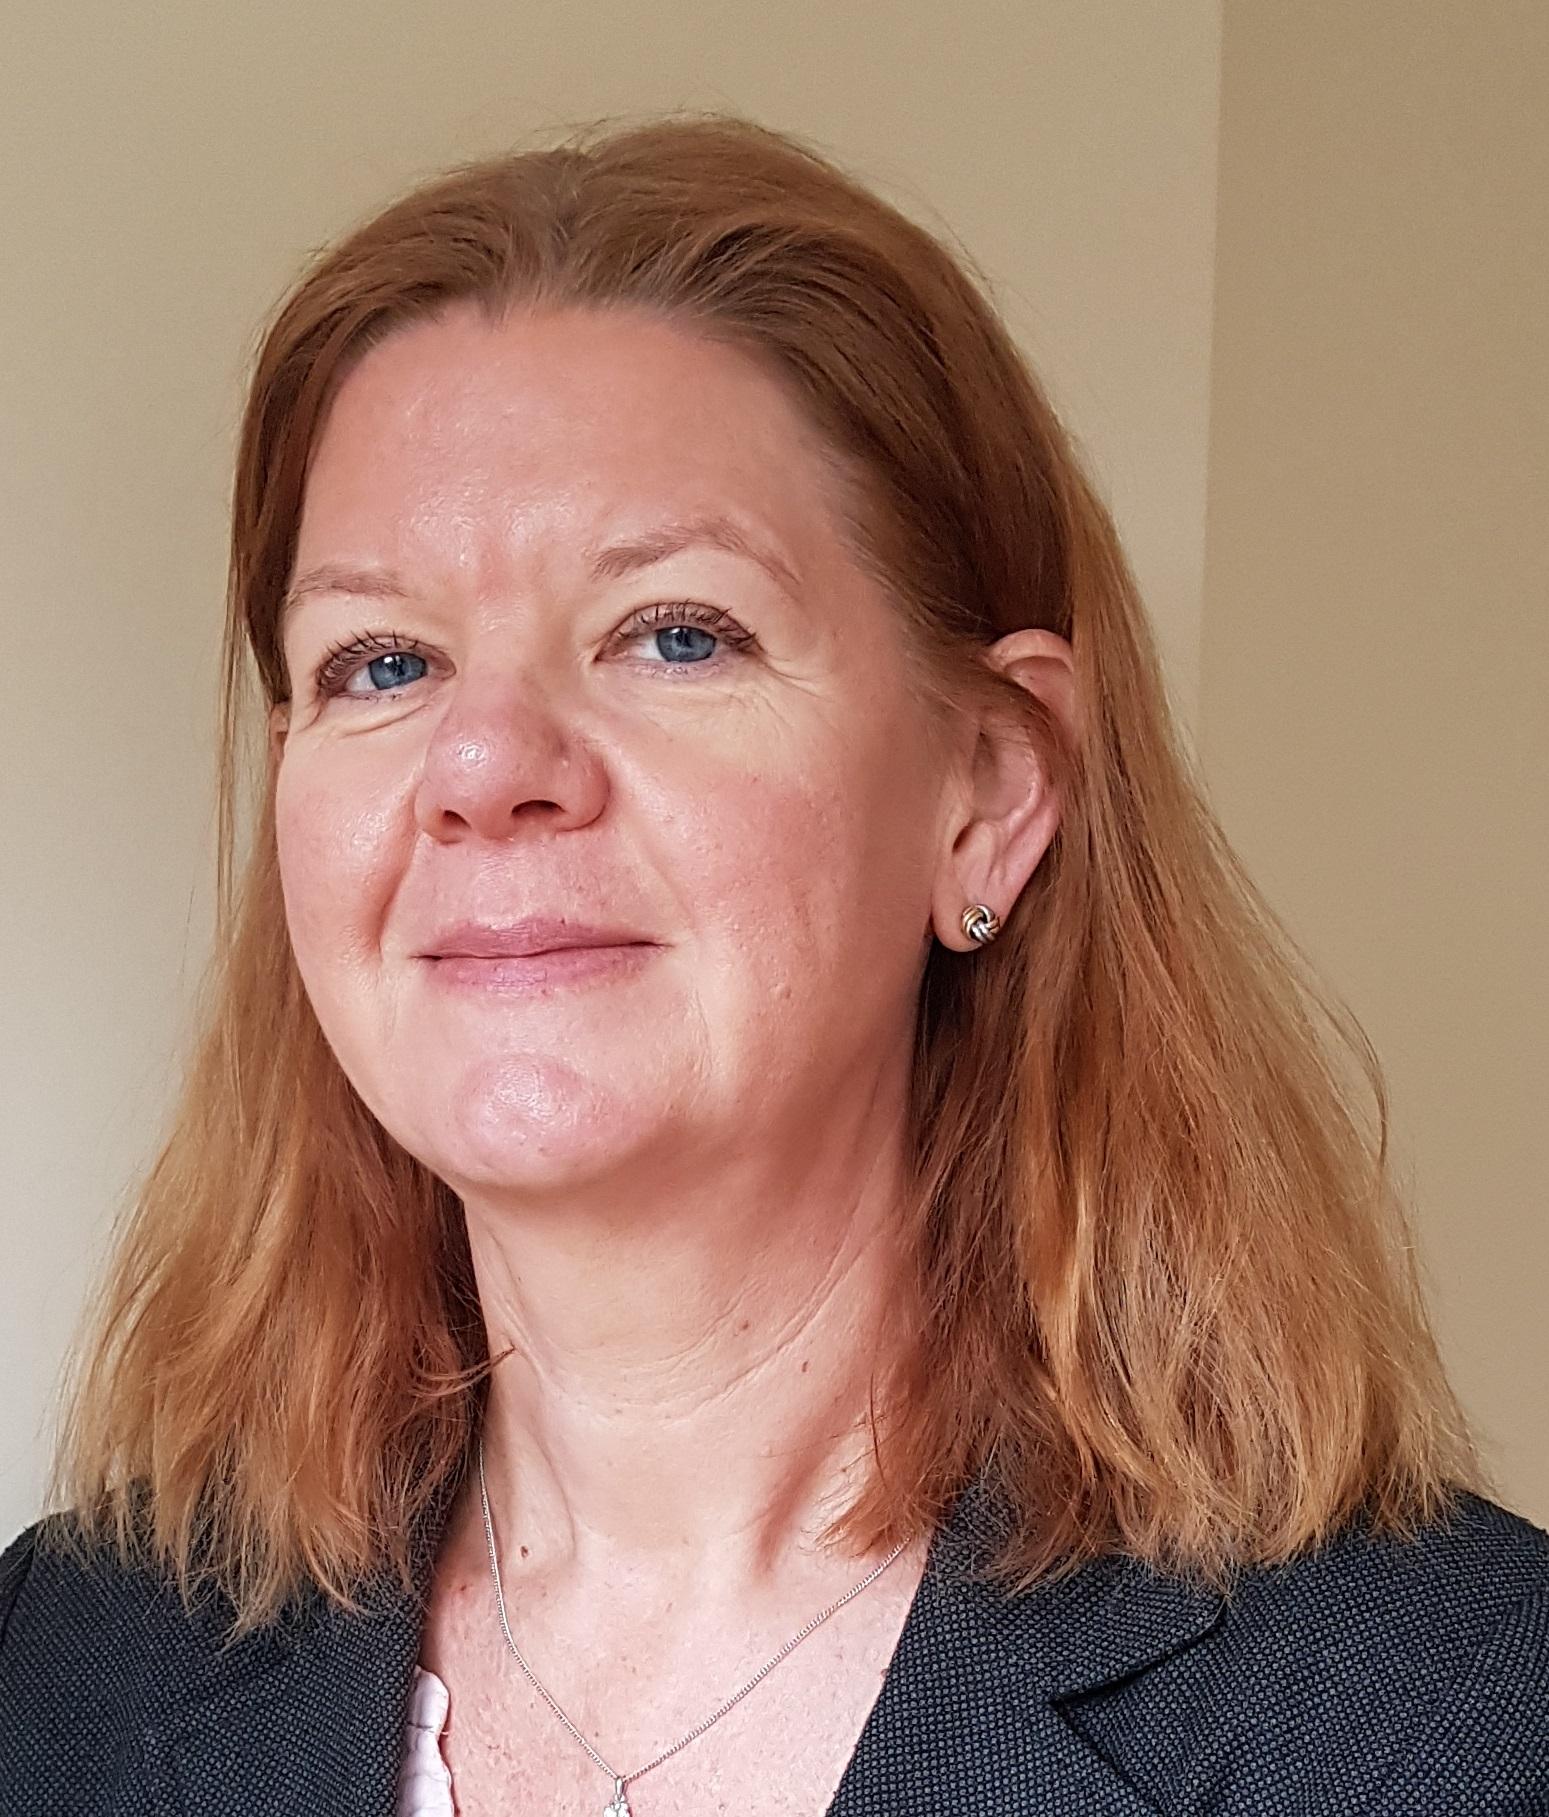 Angela G. E. M. de Boer